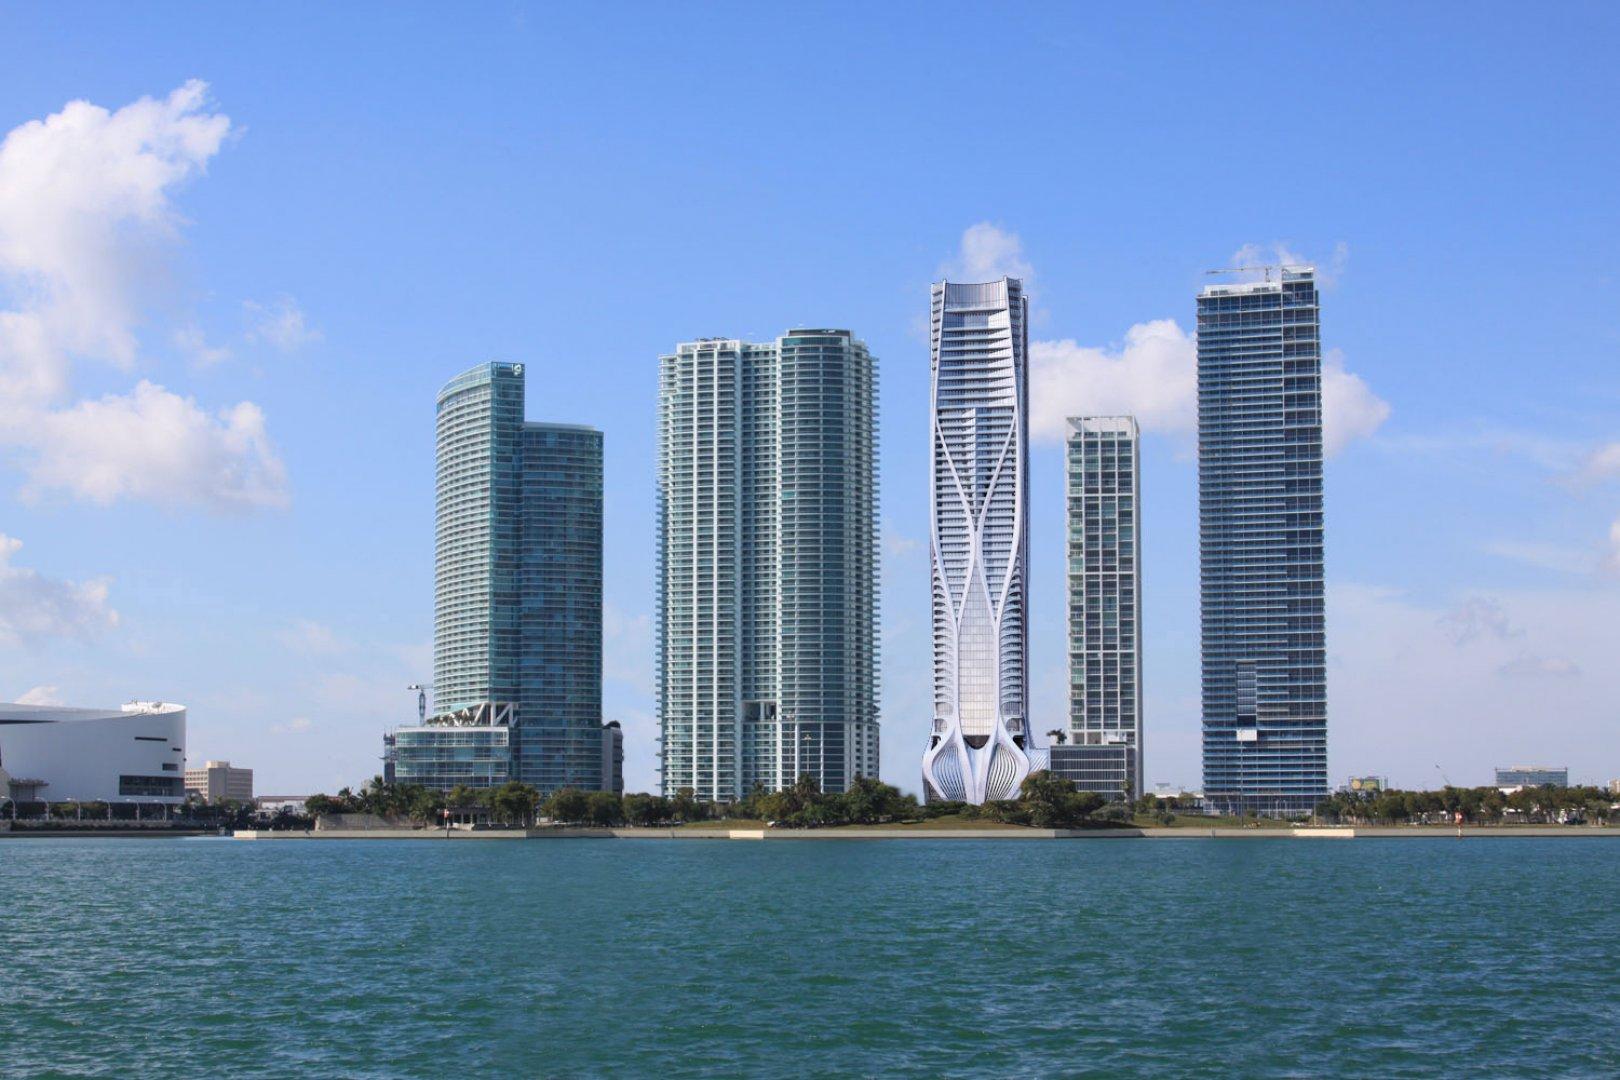 El rascacielos se llama 'One Thousand Museum'